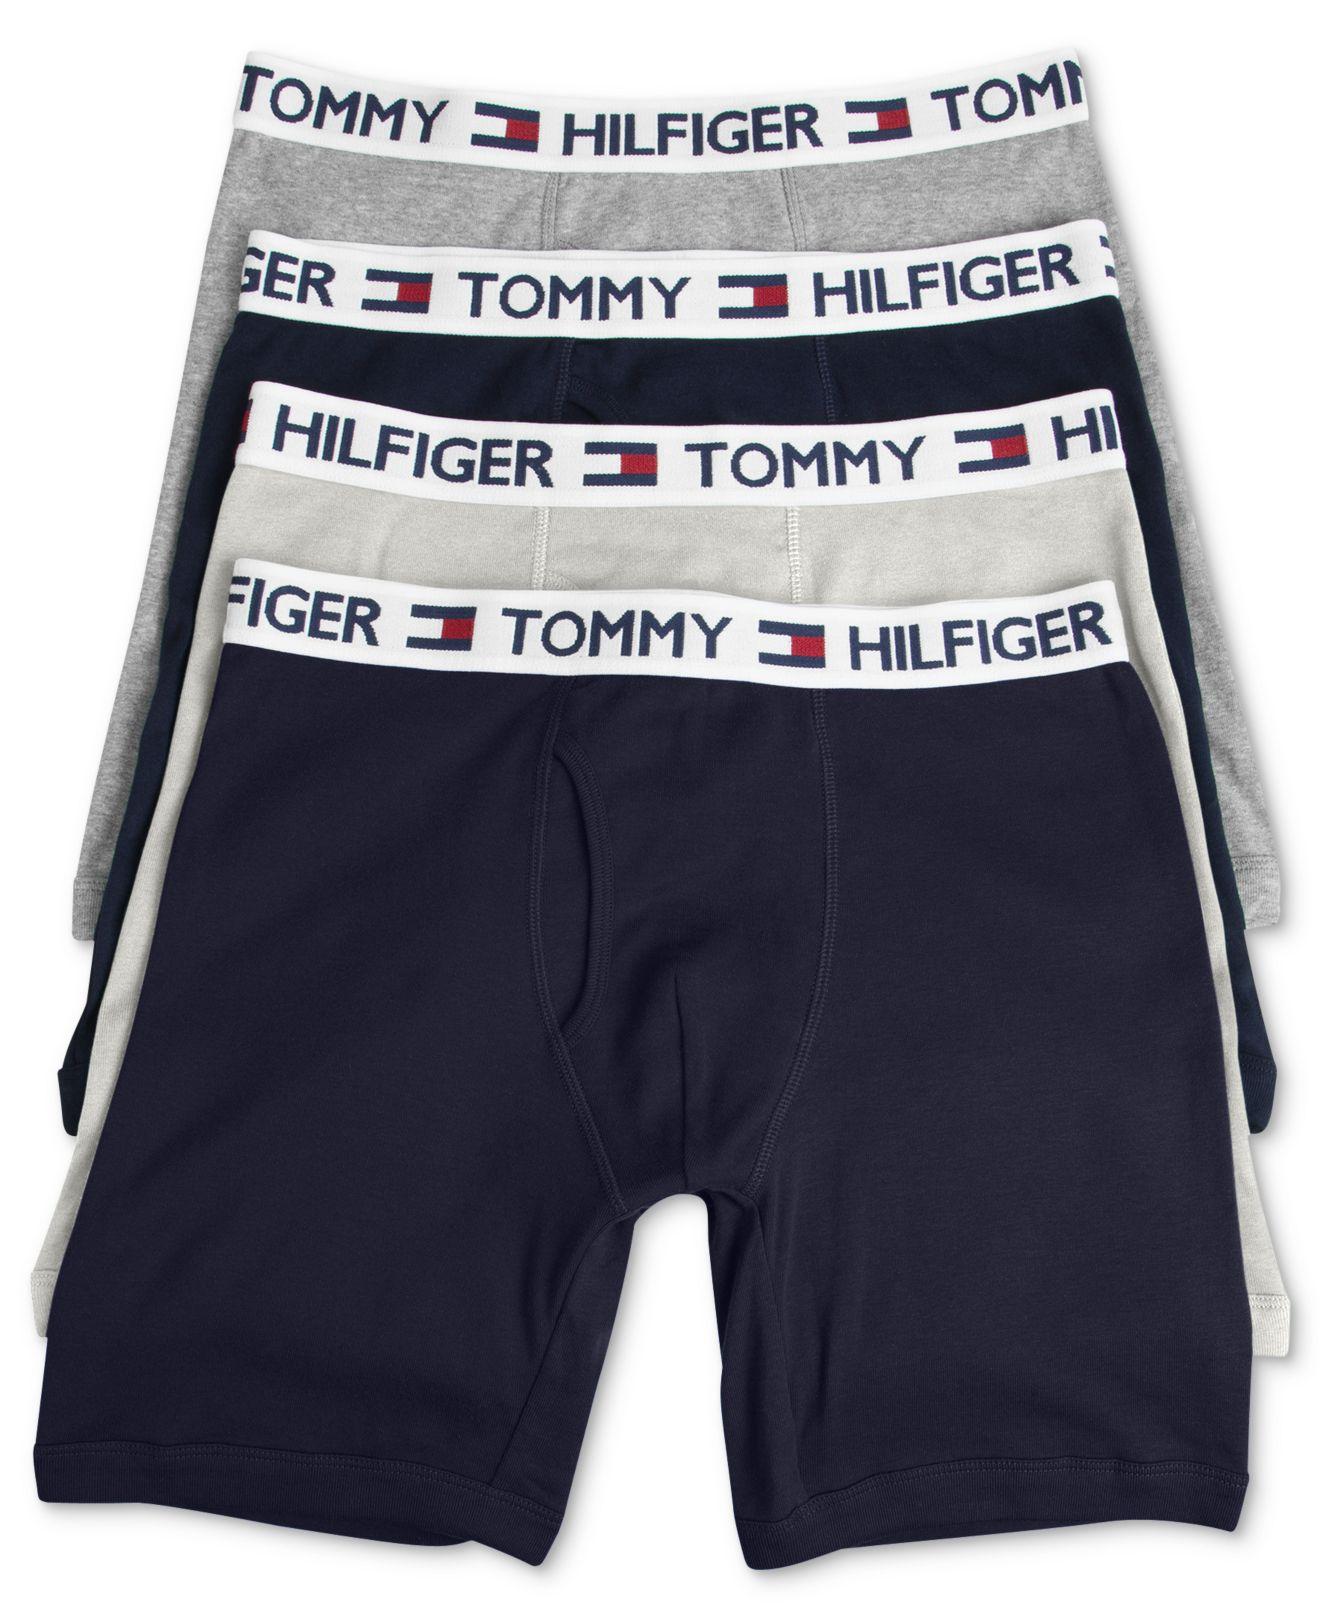 tommy hilfiger cotton boxer brief 4 pack in red for men lyst. Black Bedroom Furniture Sets. Home Design Ideas